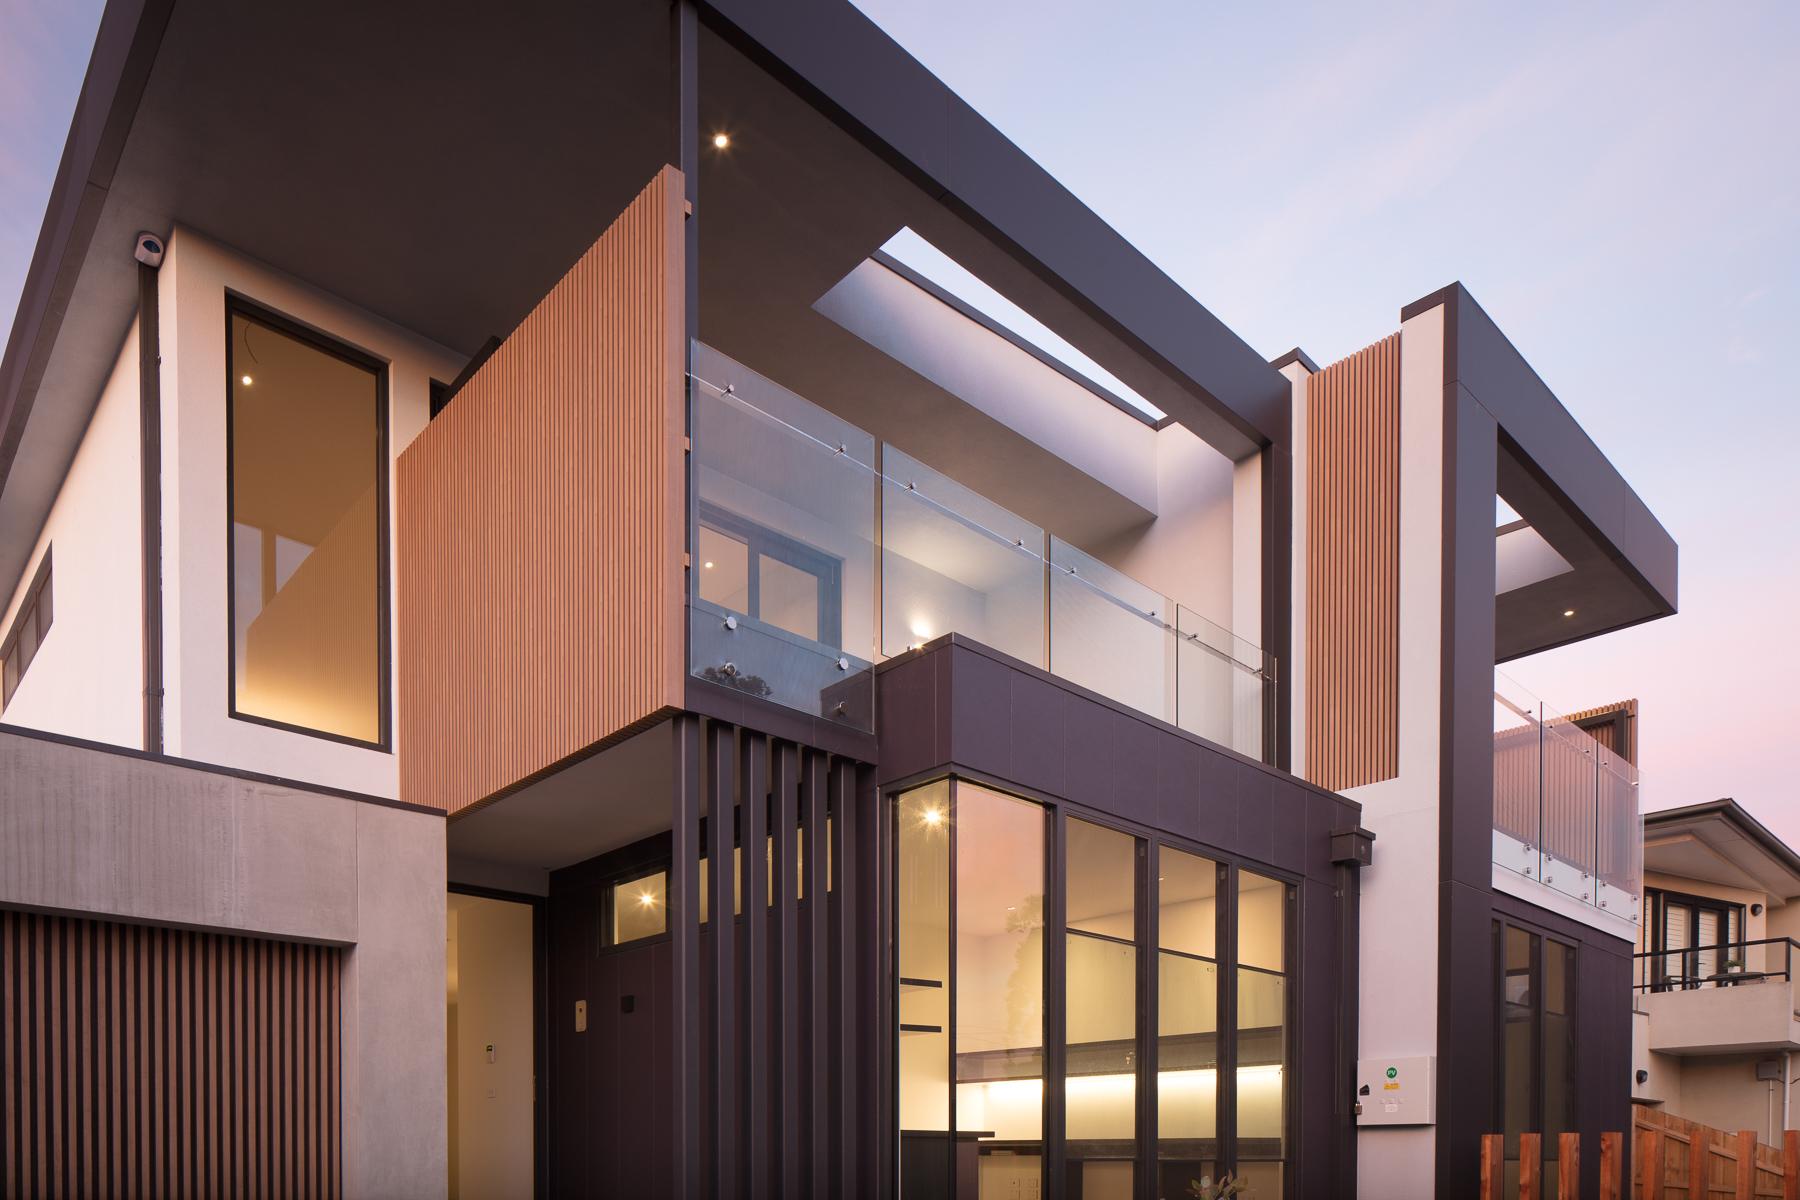 Dual townhouse development - Seaholme VIC